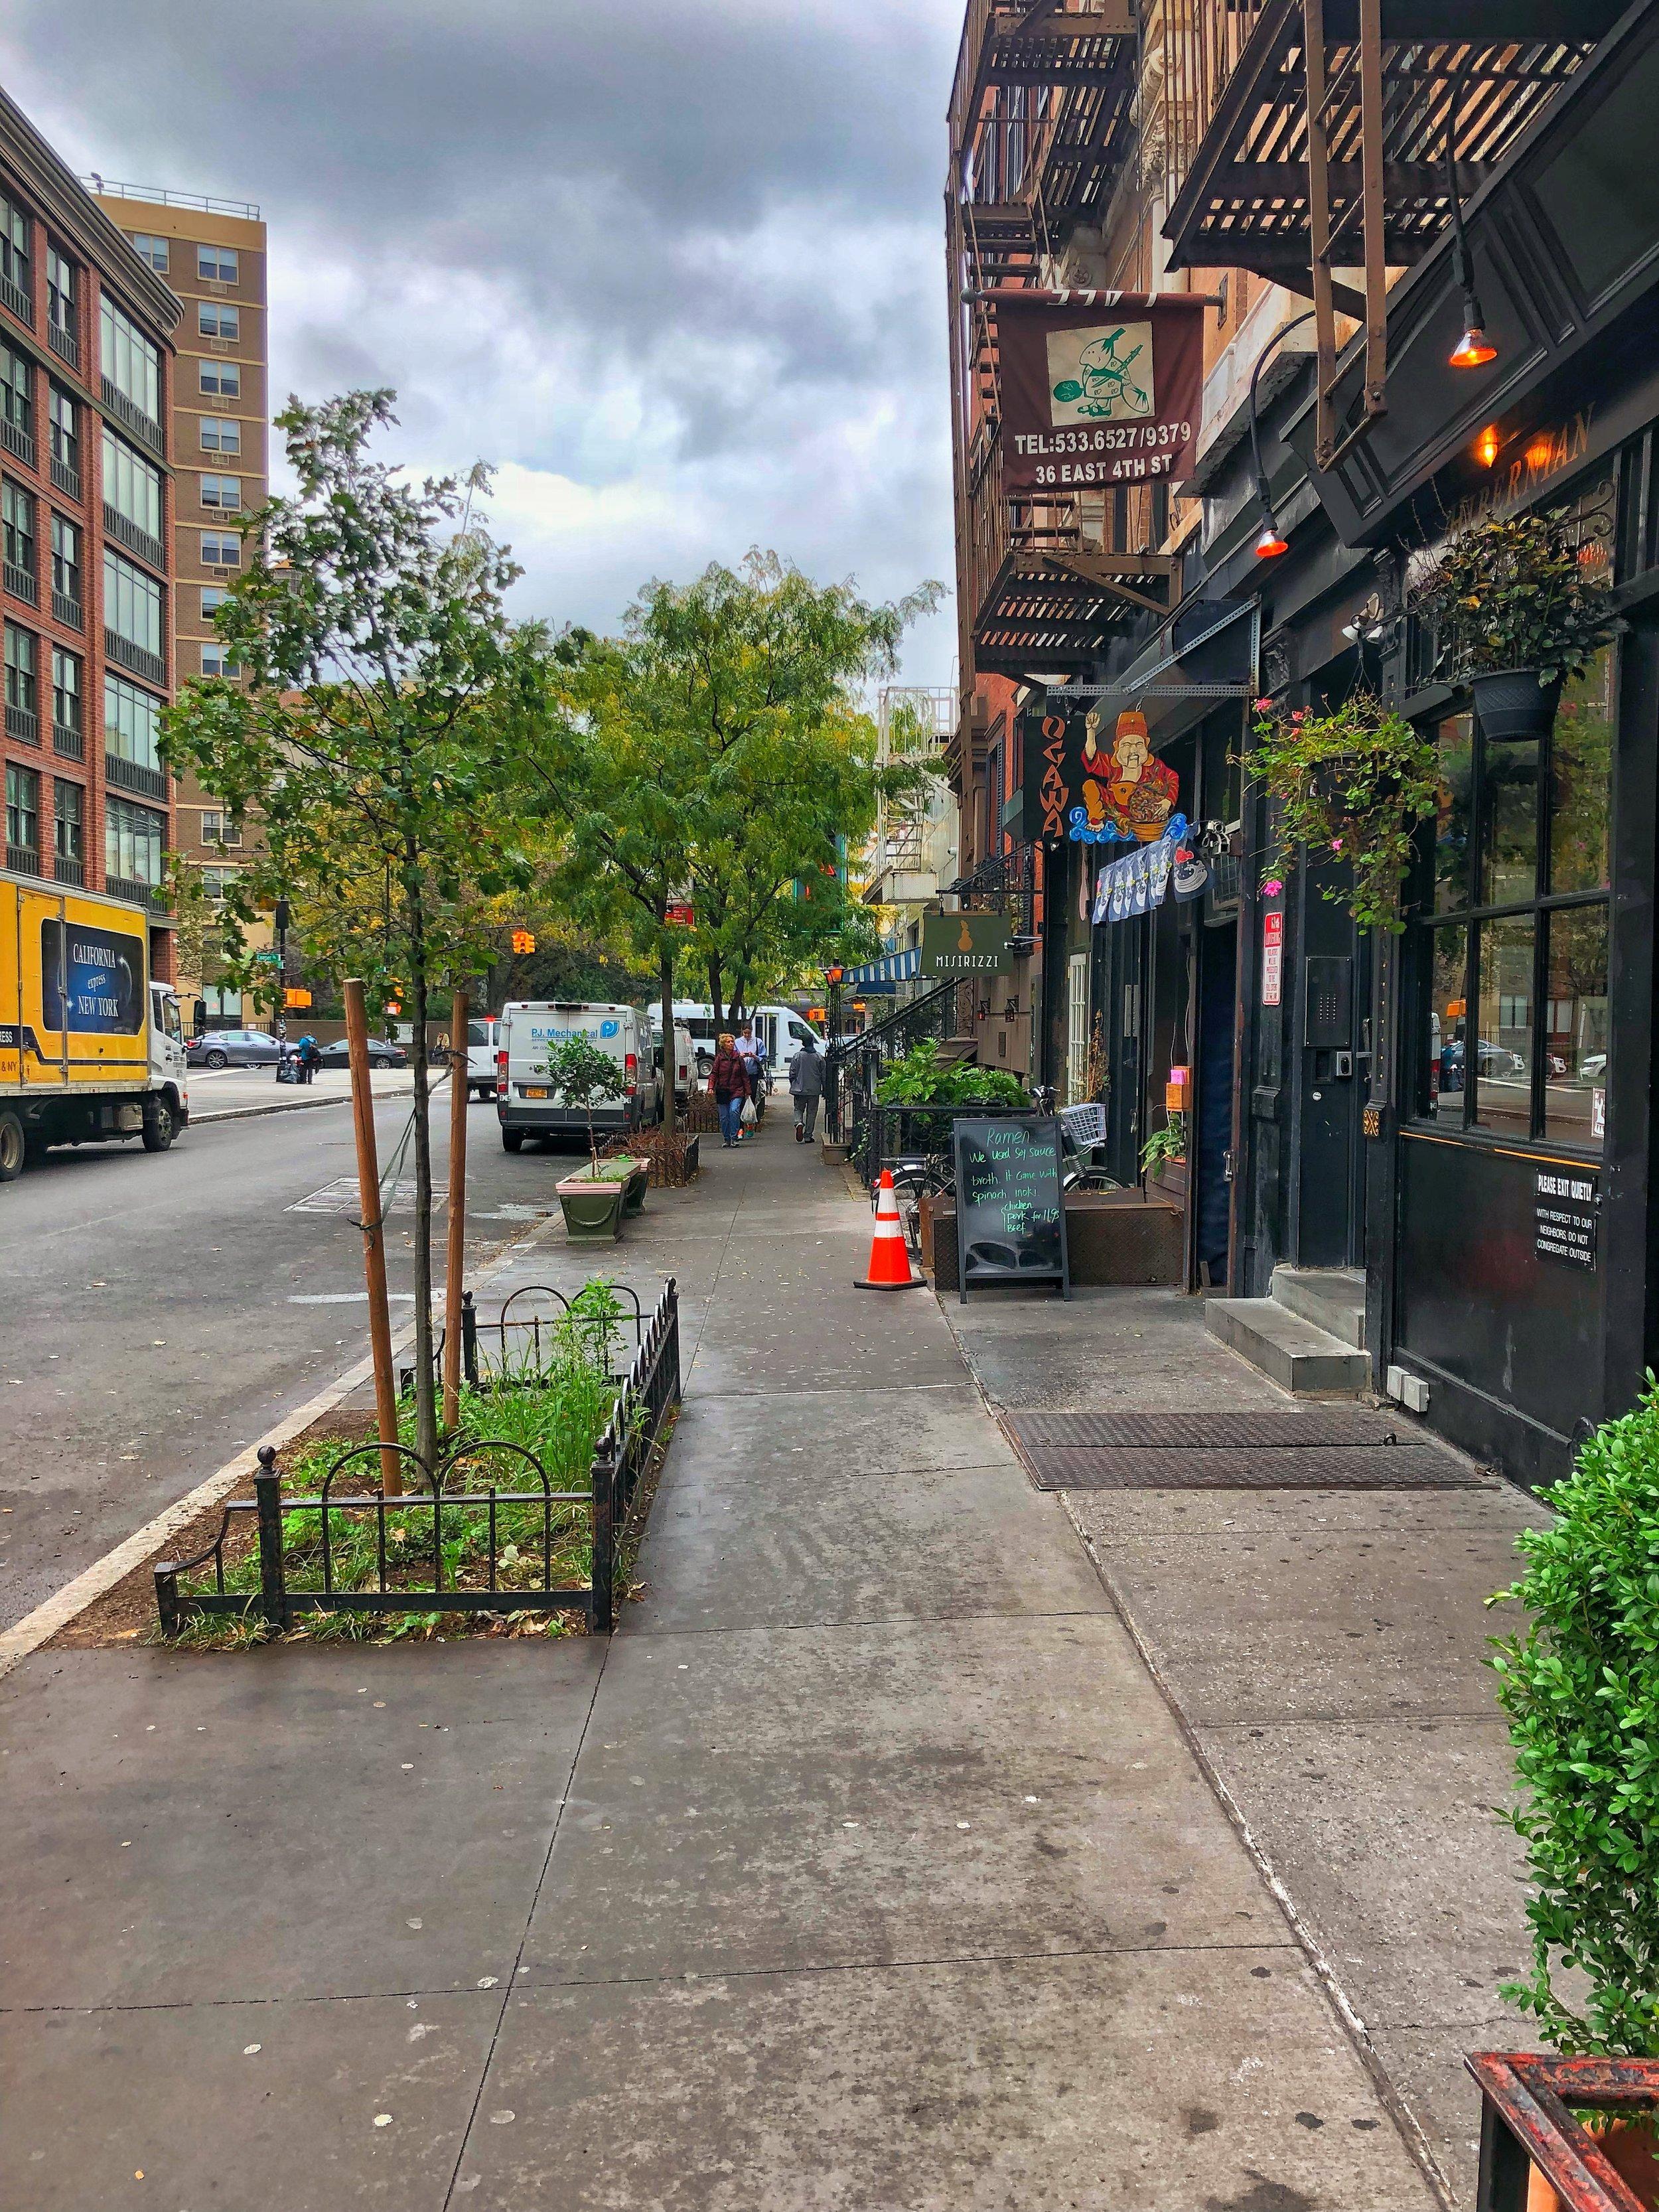 Strolling around the city